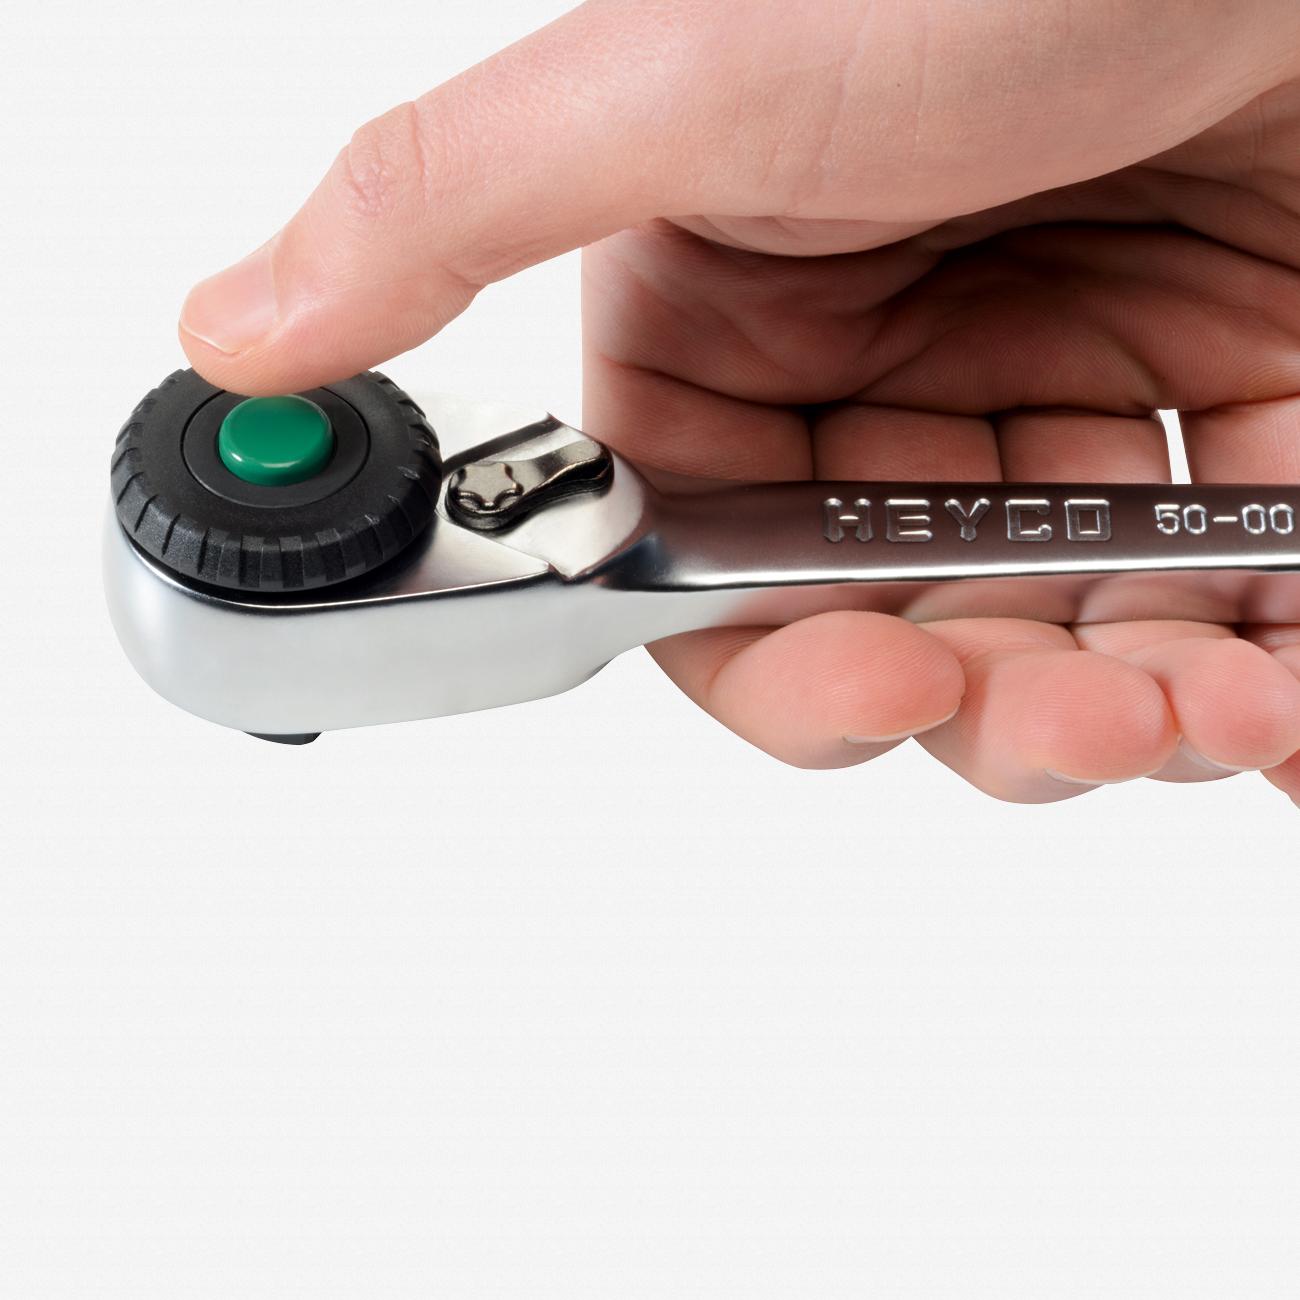 "Heyco 0500105 Varicat 72 Tooth Reversible Ratchet - 1/2"" Drive - KC Tool"